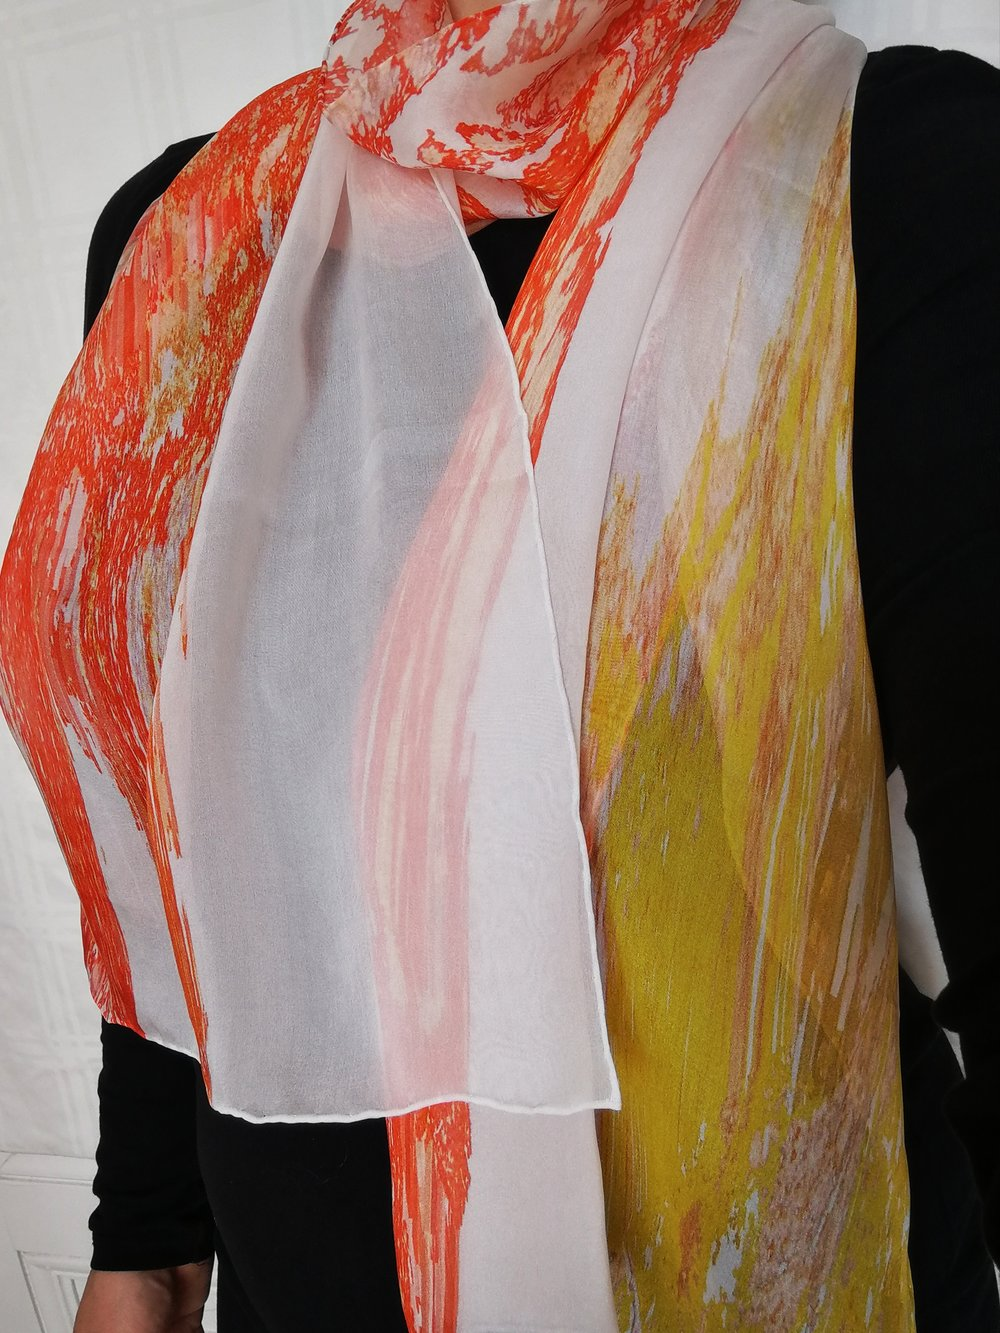 051 Feathers, orange